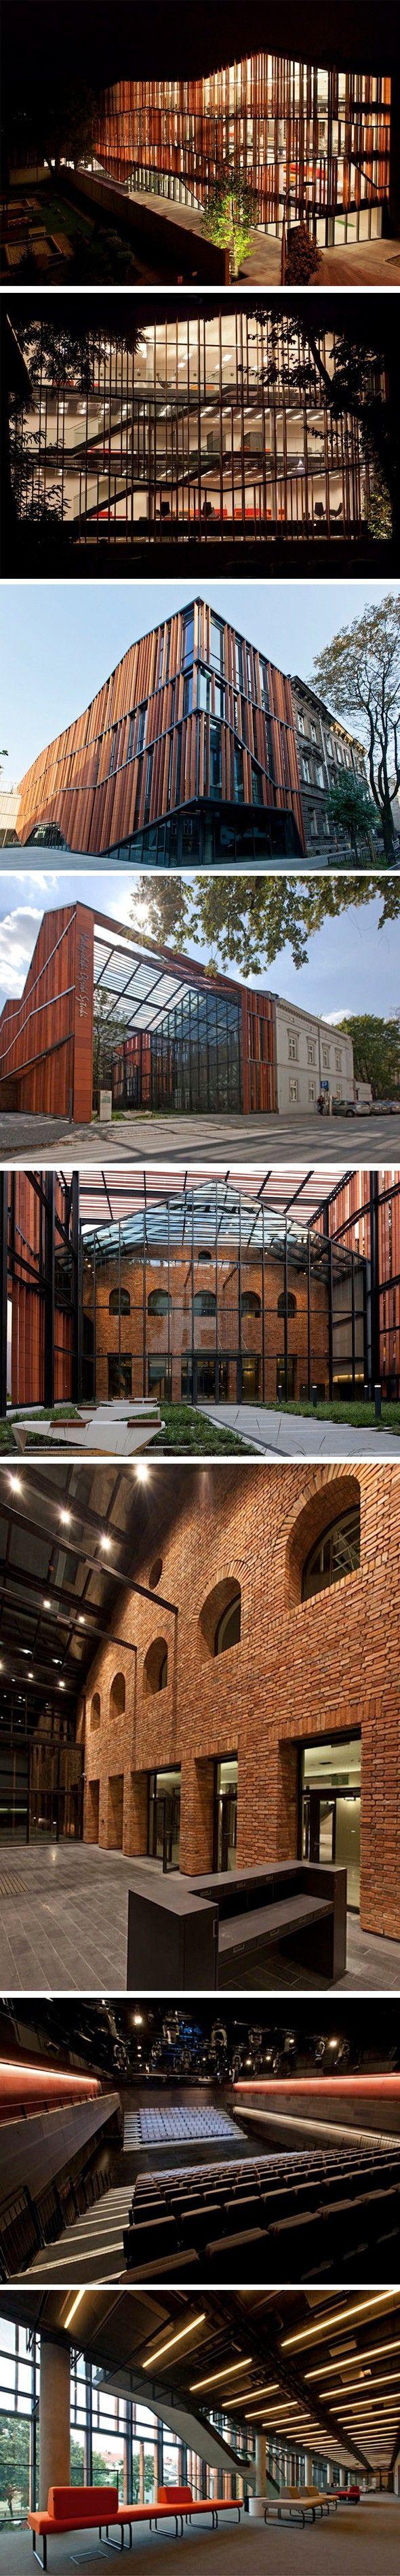 Malopolska - Garden Of Arts // Cracovie Krakow